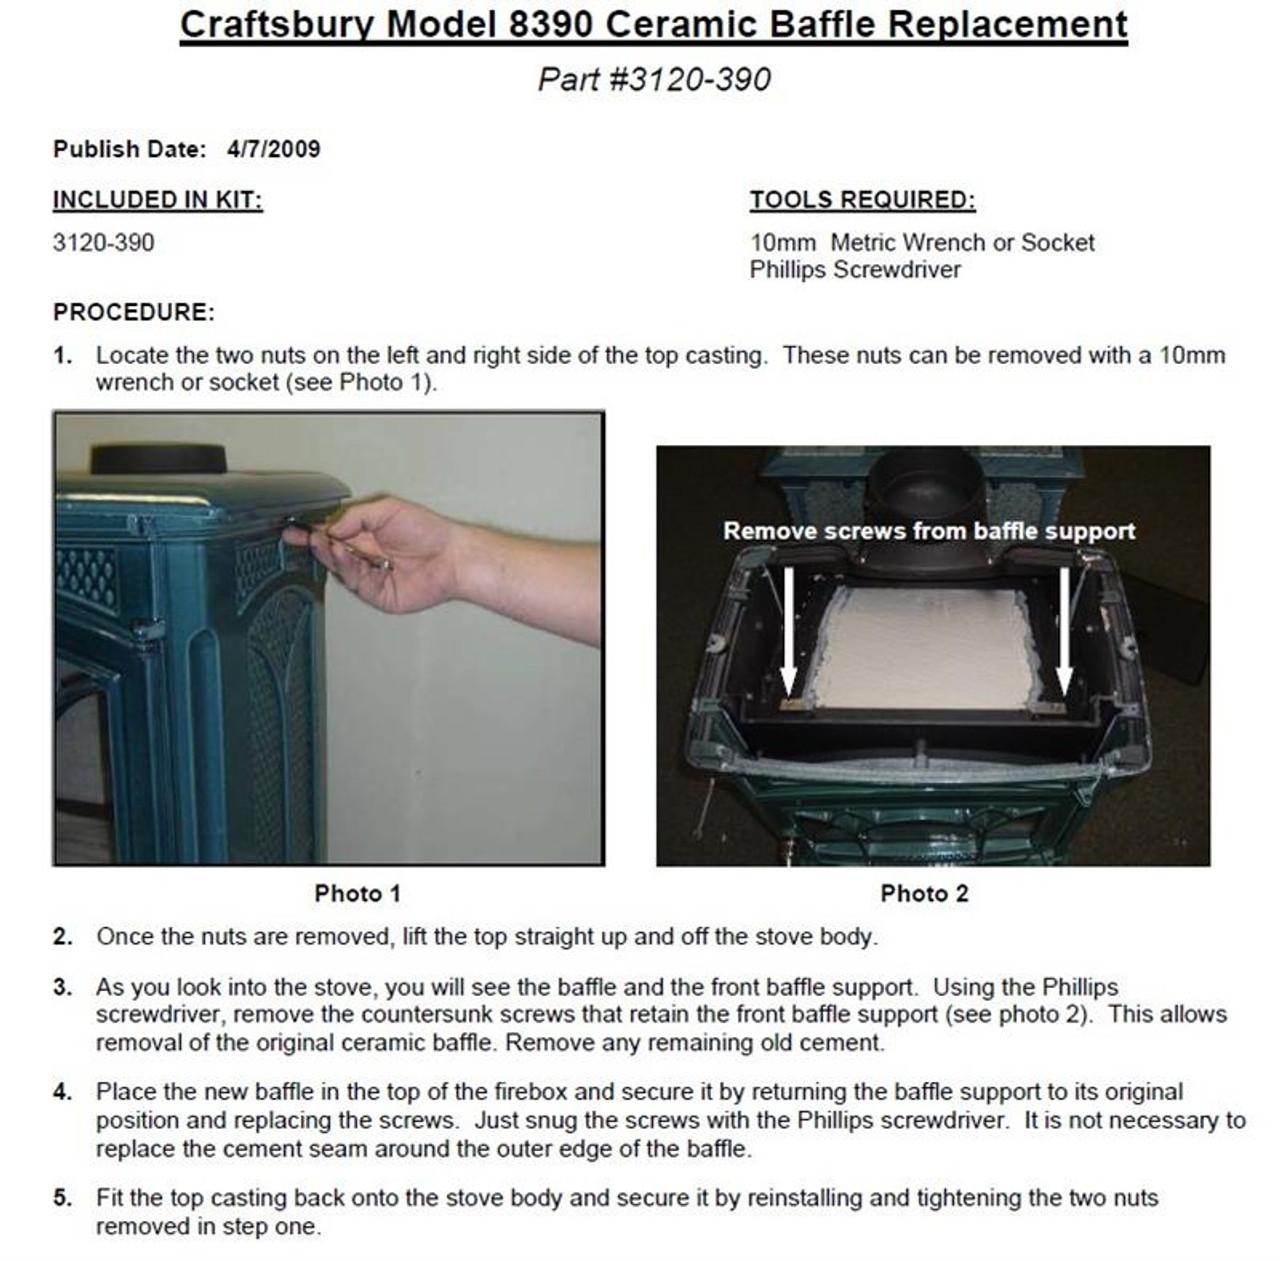 Craftsbury Ceramic Baffle 3120-390